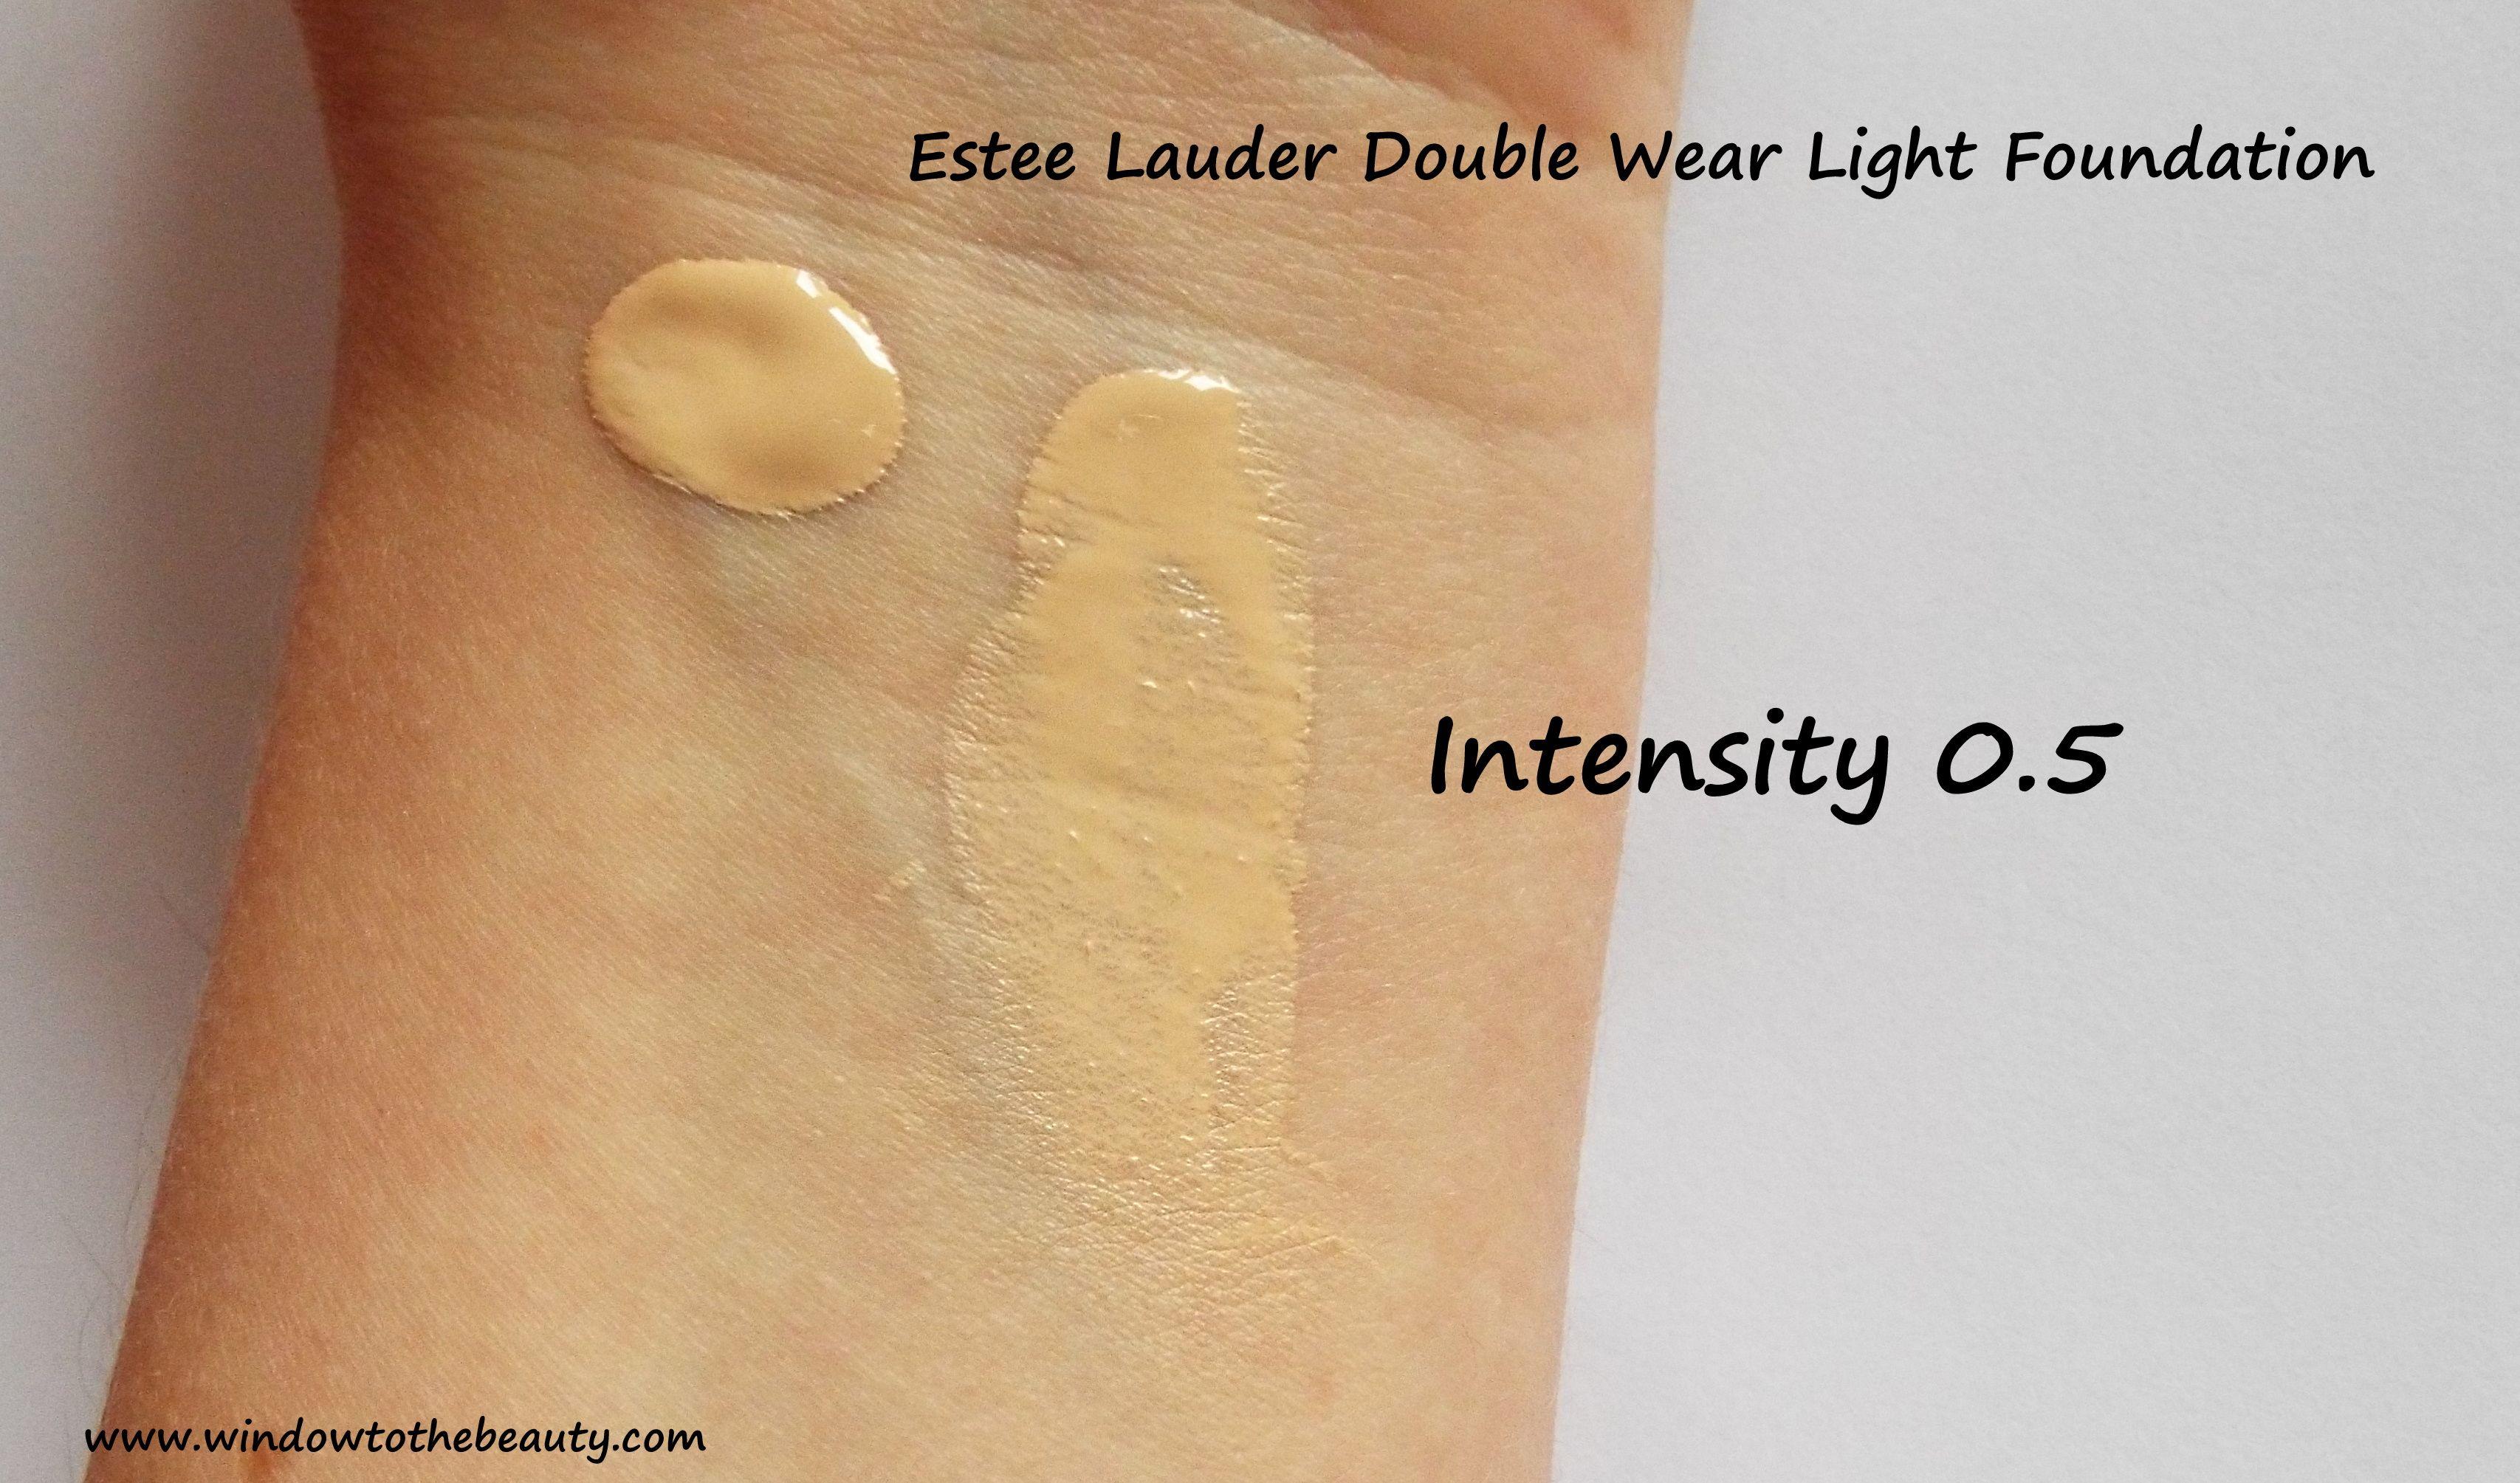 Charming Estee Lauder Double Wear Light Foundation 0.5 Amazing Design